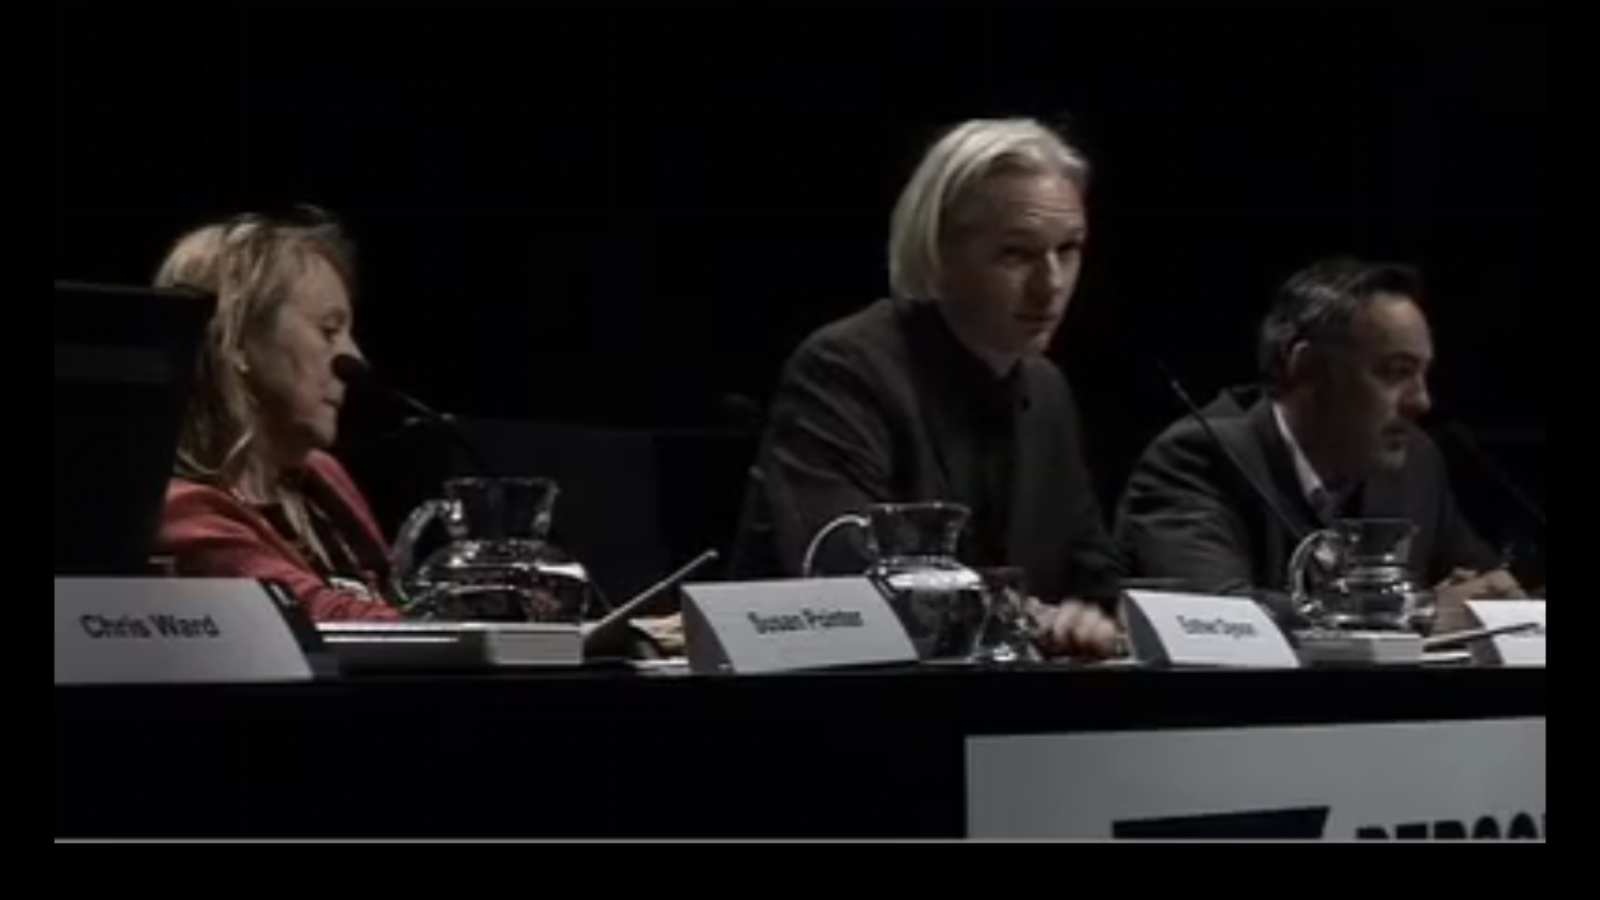 La visita d'Assange a Barcelona